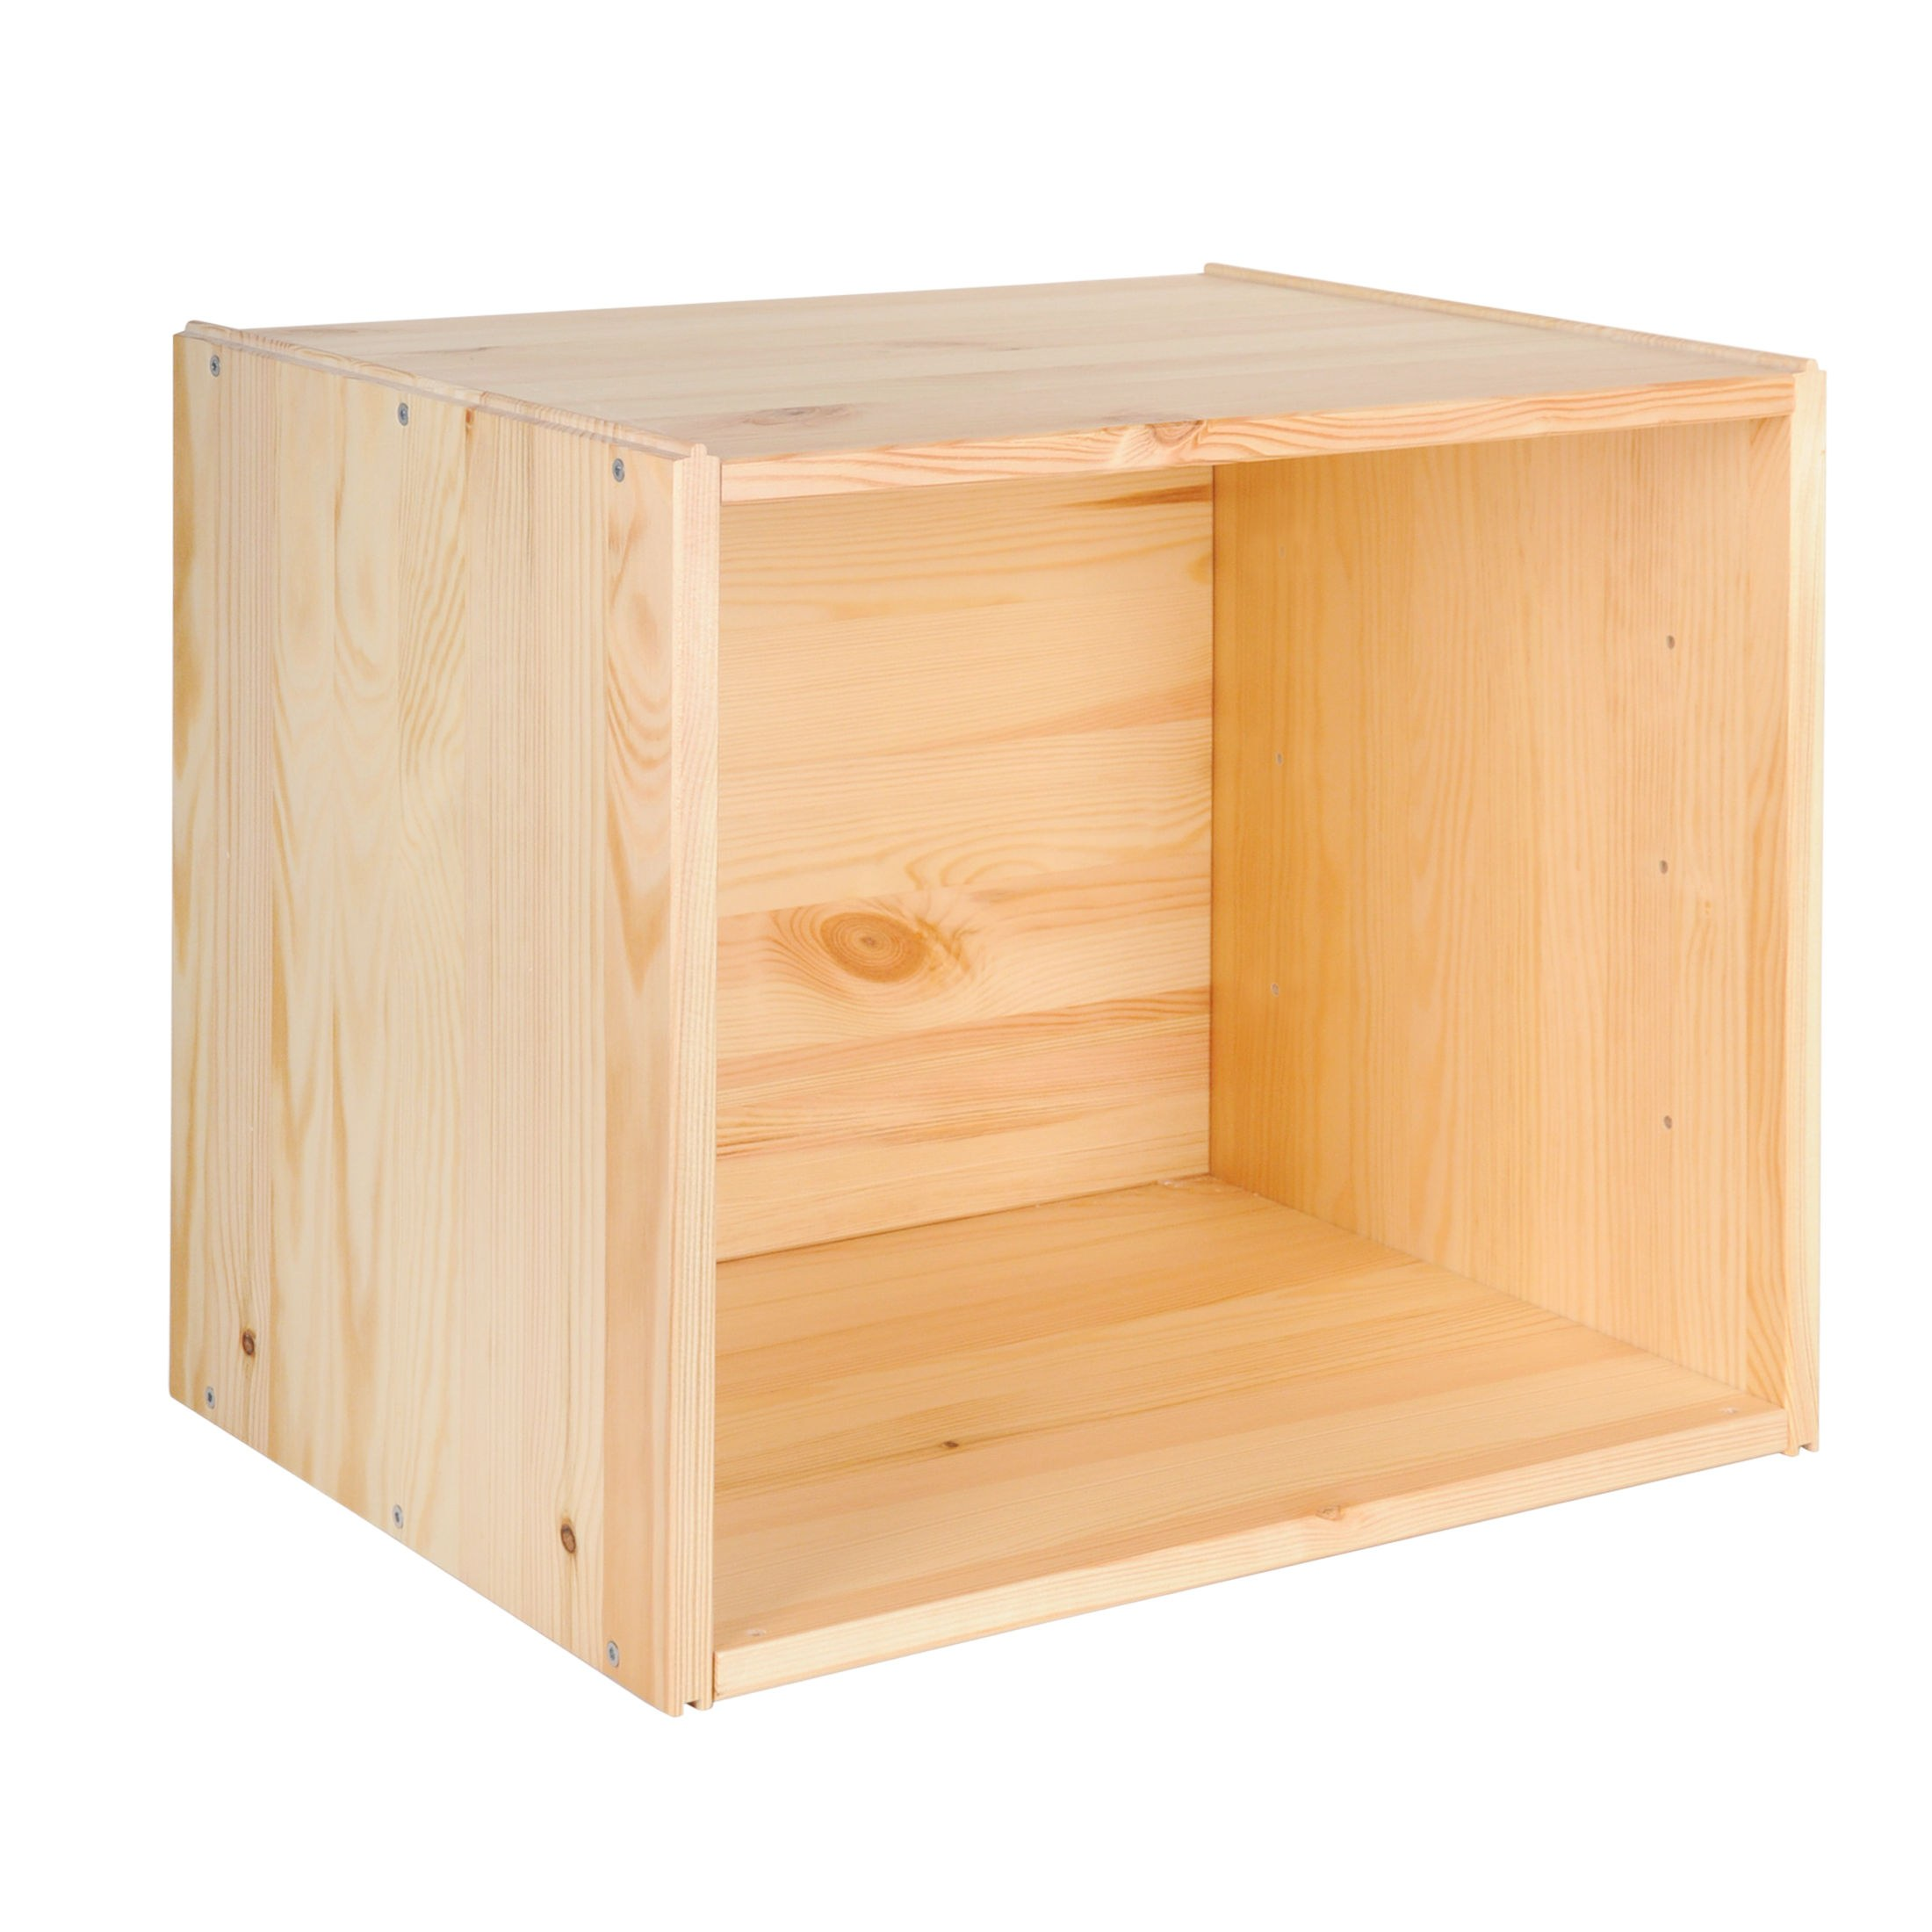 Weinlagerbox-Weinregal-034-034-Easy-034-034-Kiefernholz-stapelbar-erweiterbar-H-39-x